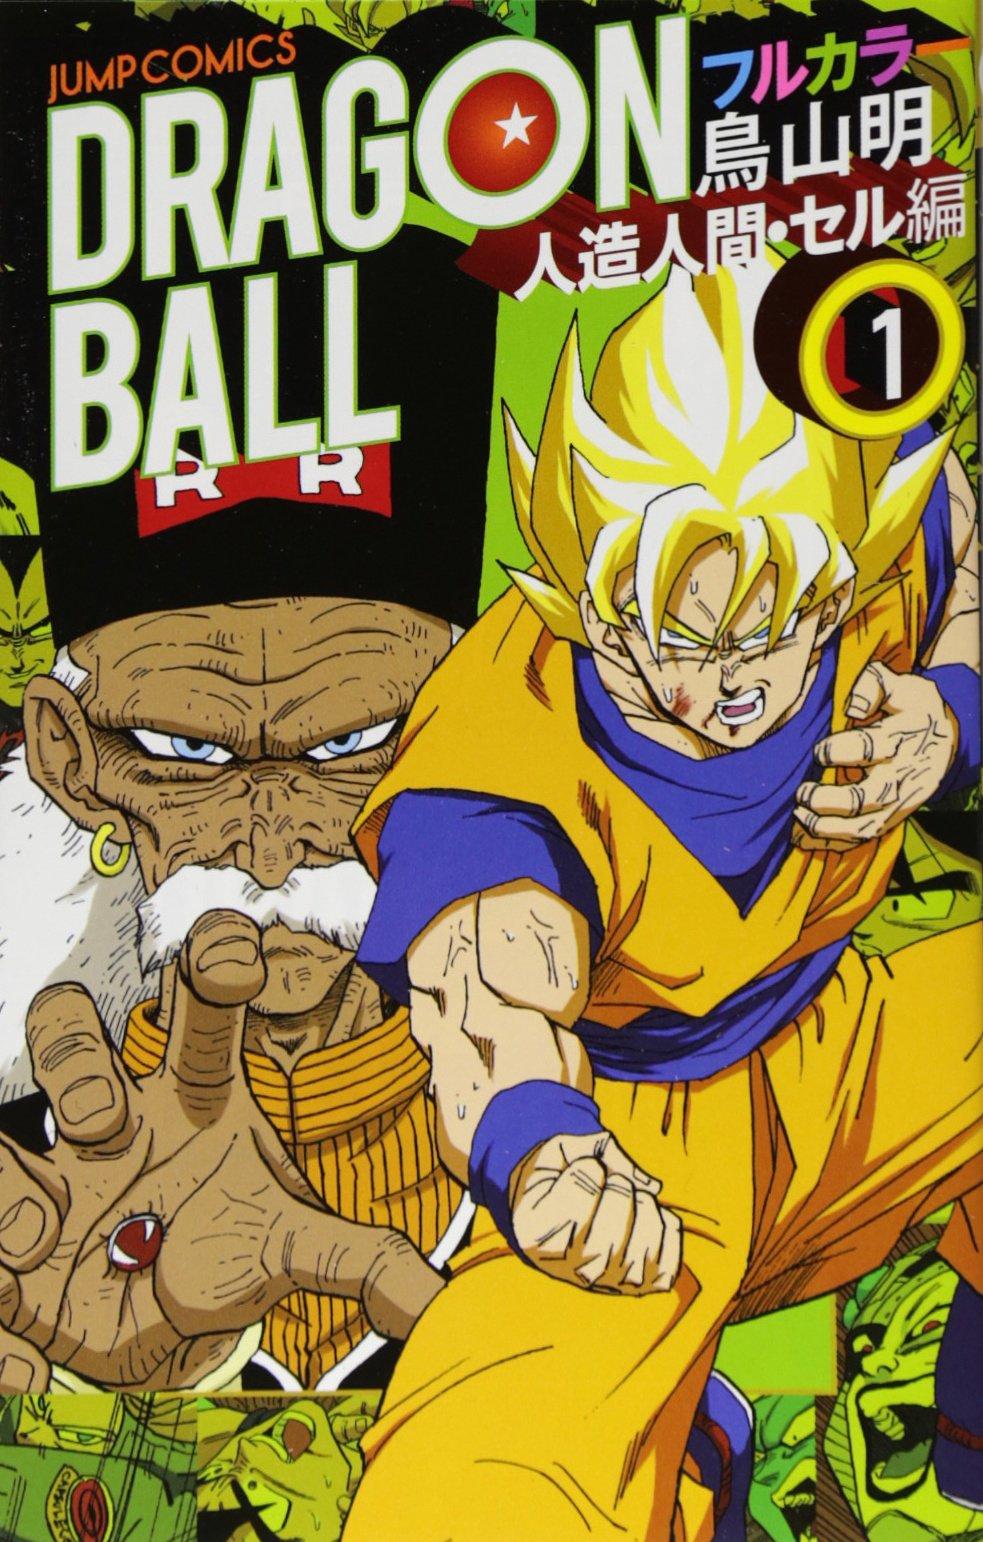 dragon ball full color  Dragon Ball Full Color Android Cell - Vol.1 (Jump Comics) Manga ...